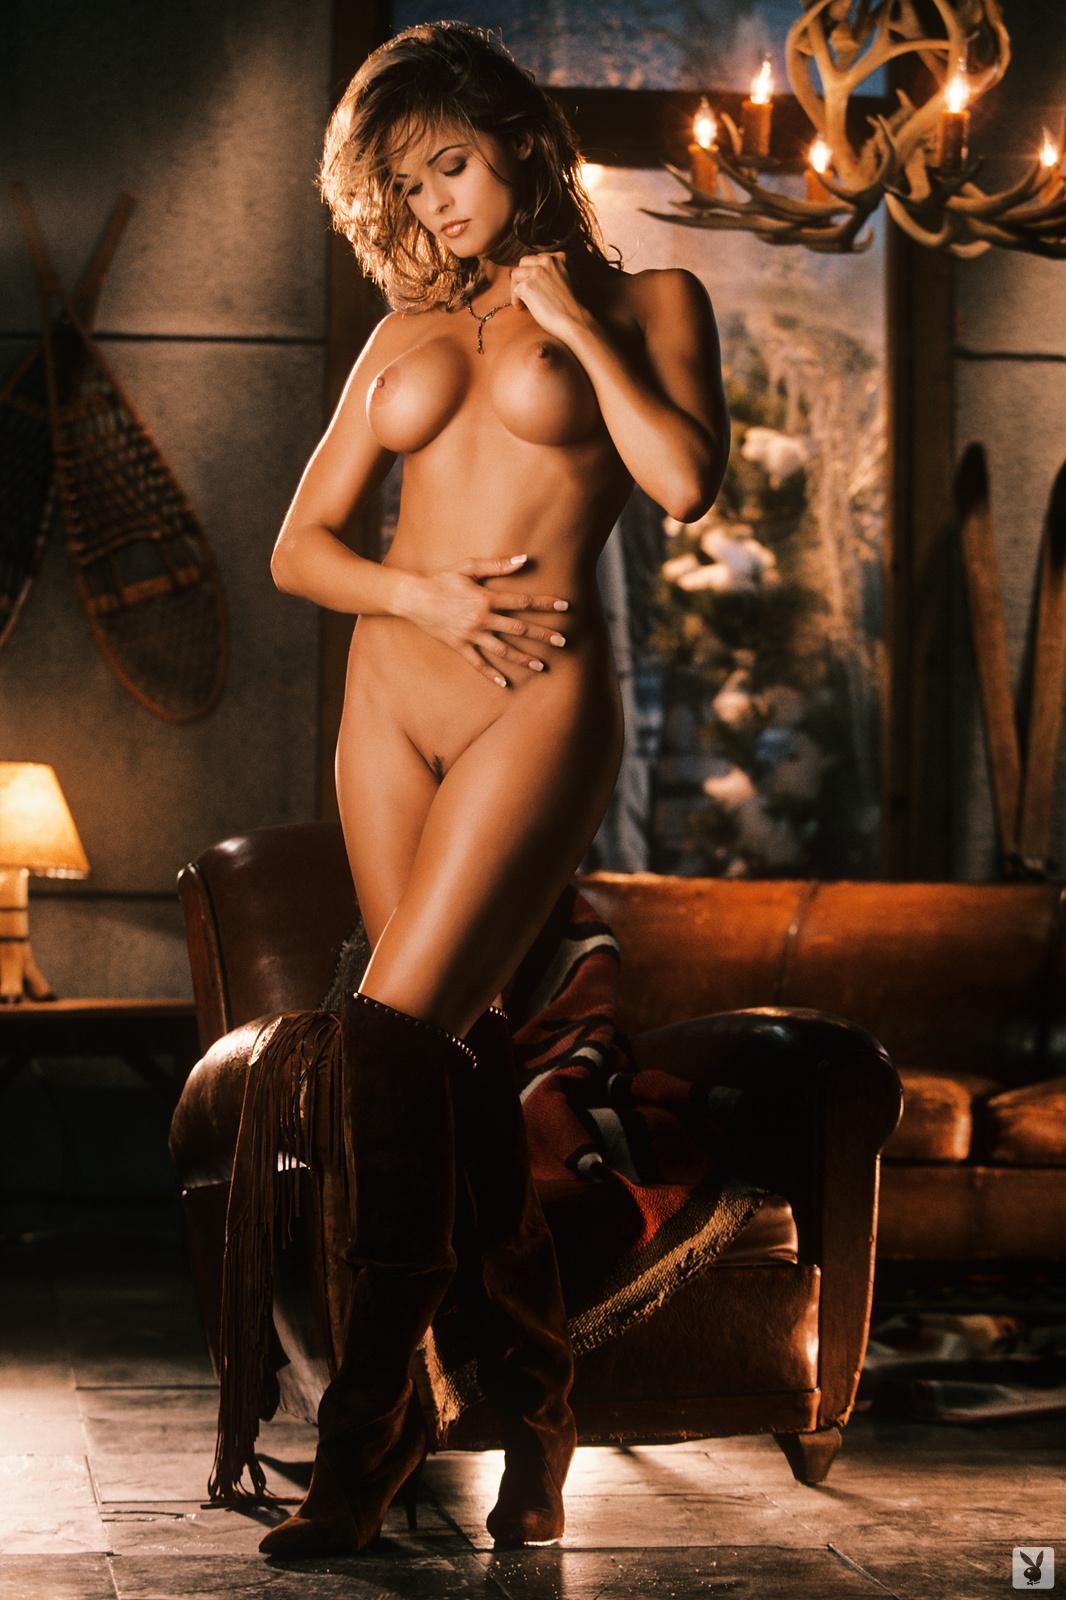 Karen mcdougal nudes pics 3